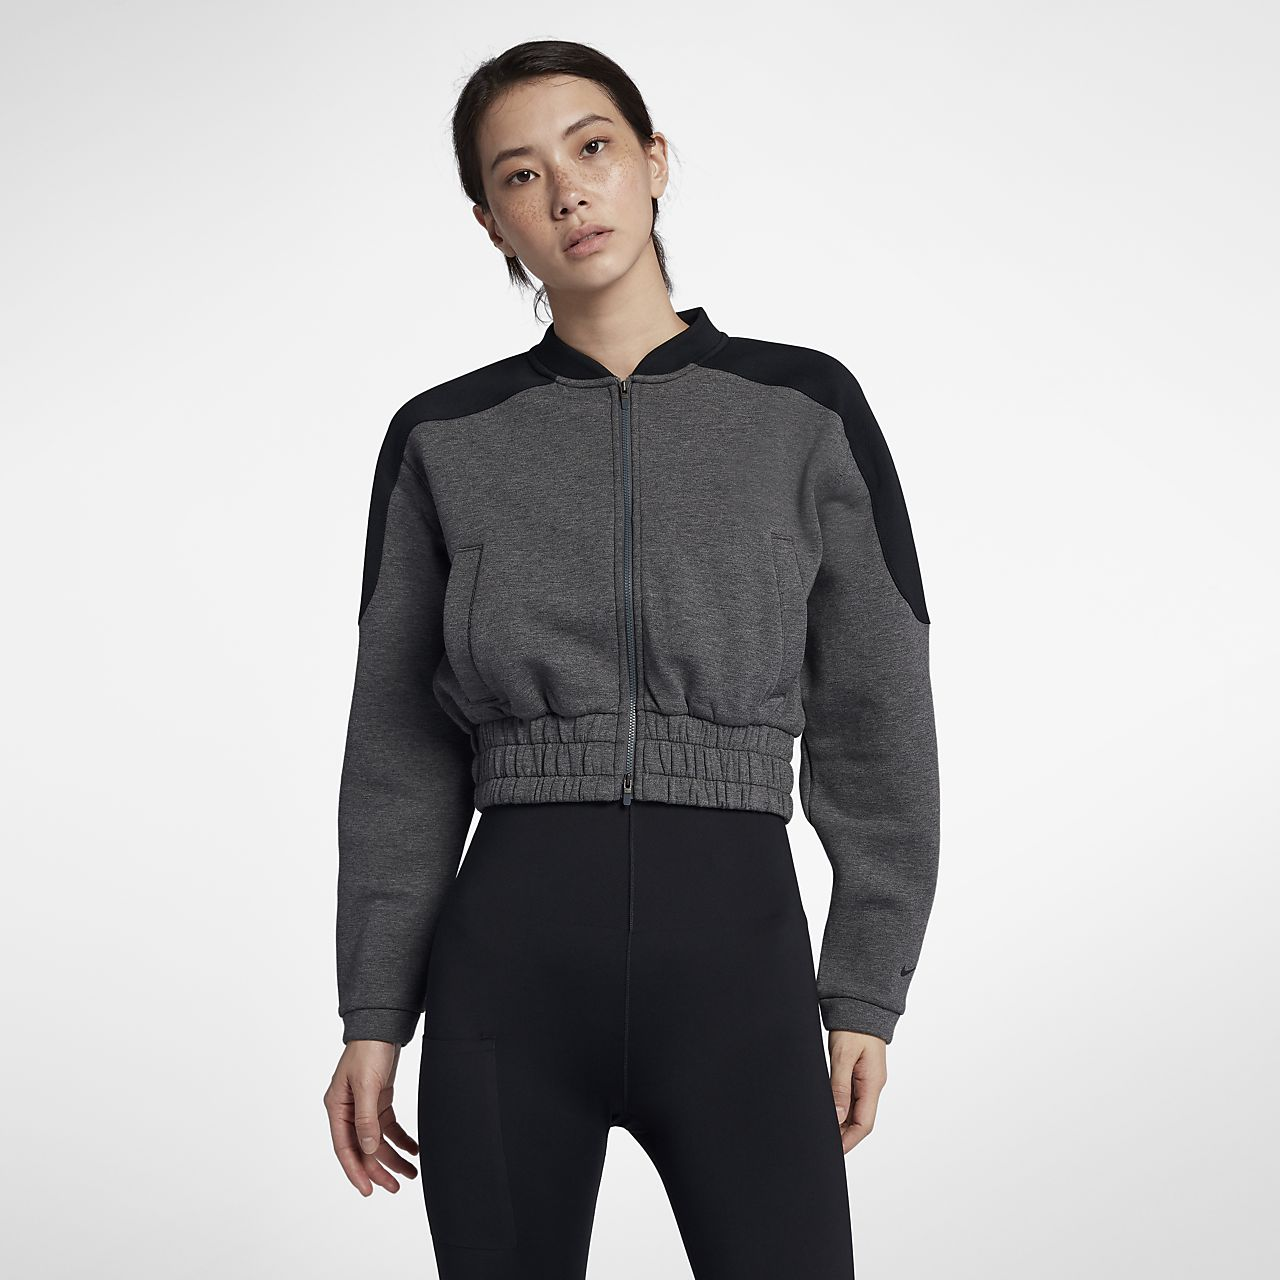 ae1790ef3c18 Nike Dri-FIT Women s Full-Zip Training Bomber Jacket. Nike.com